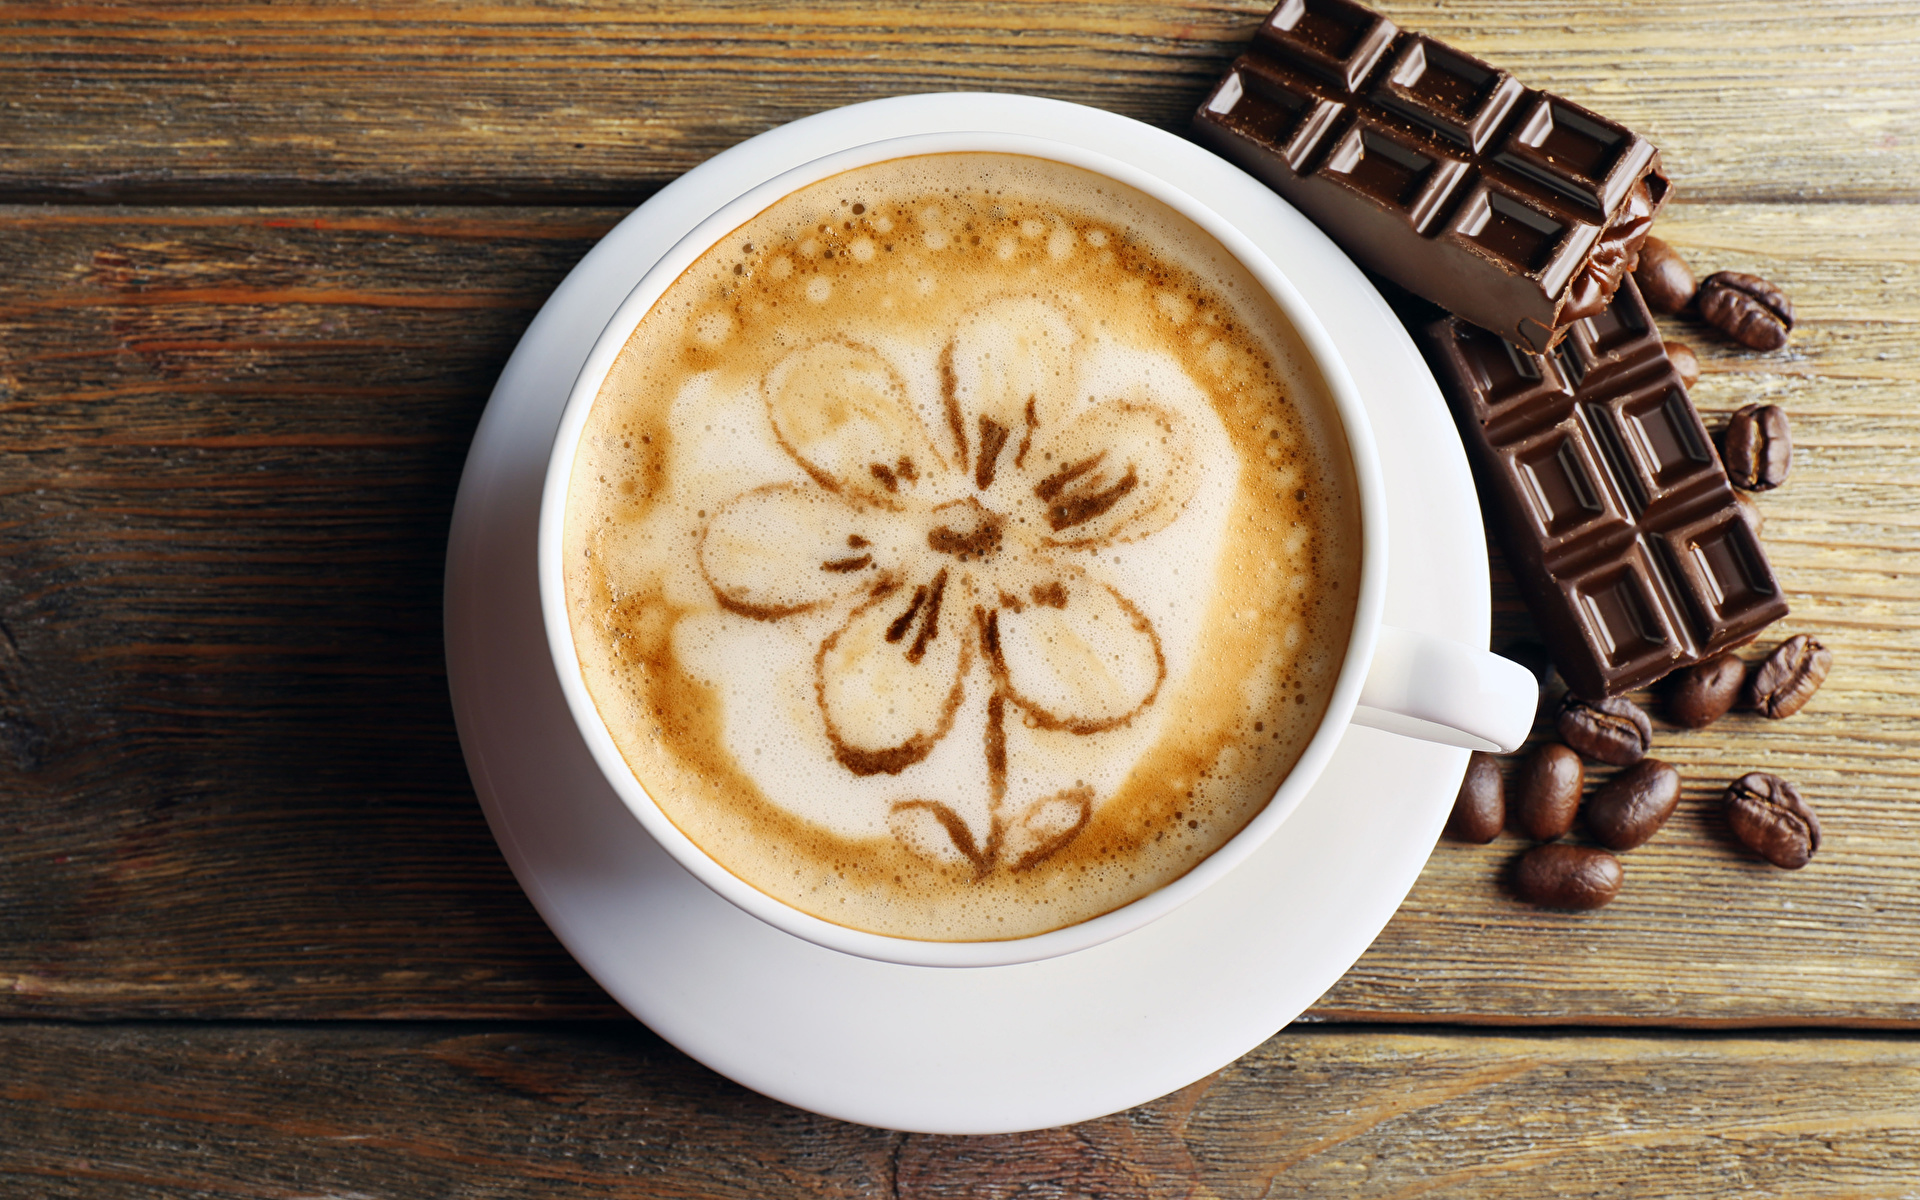 Фото Шоколад Кофе Капучино Зерна Чашка Продукты питания Доски 1920x1200 Еда Пища